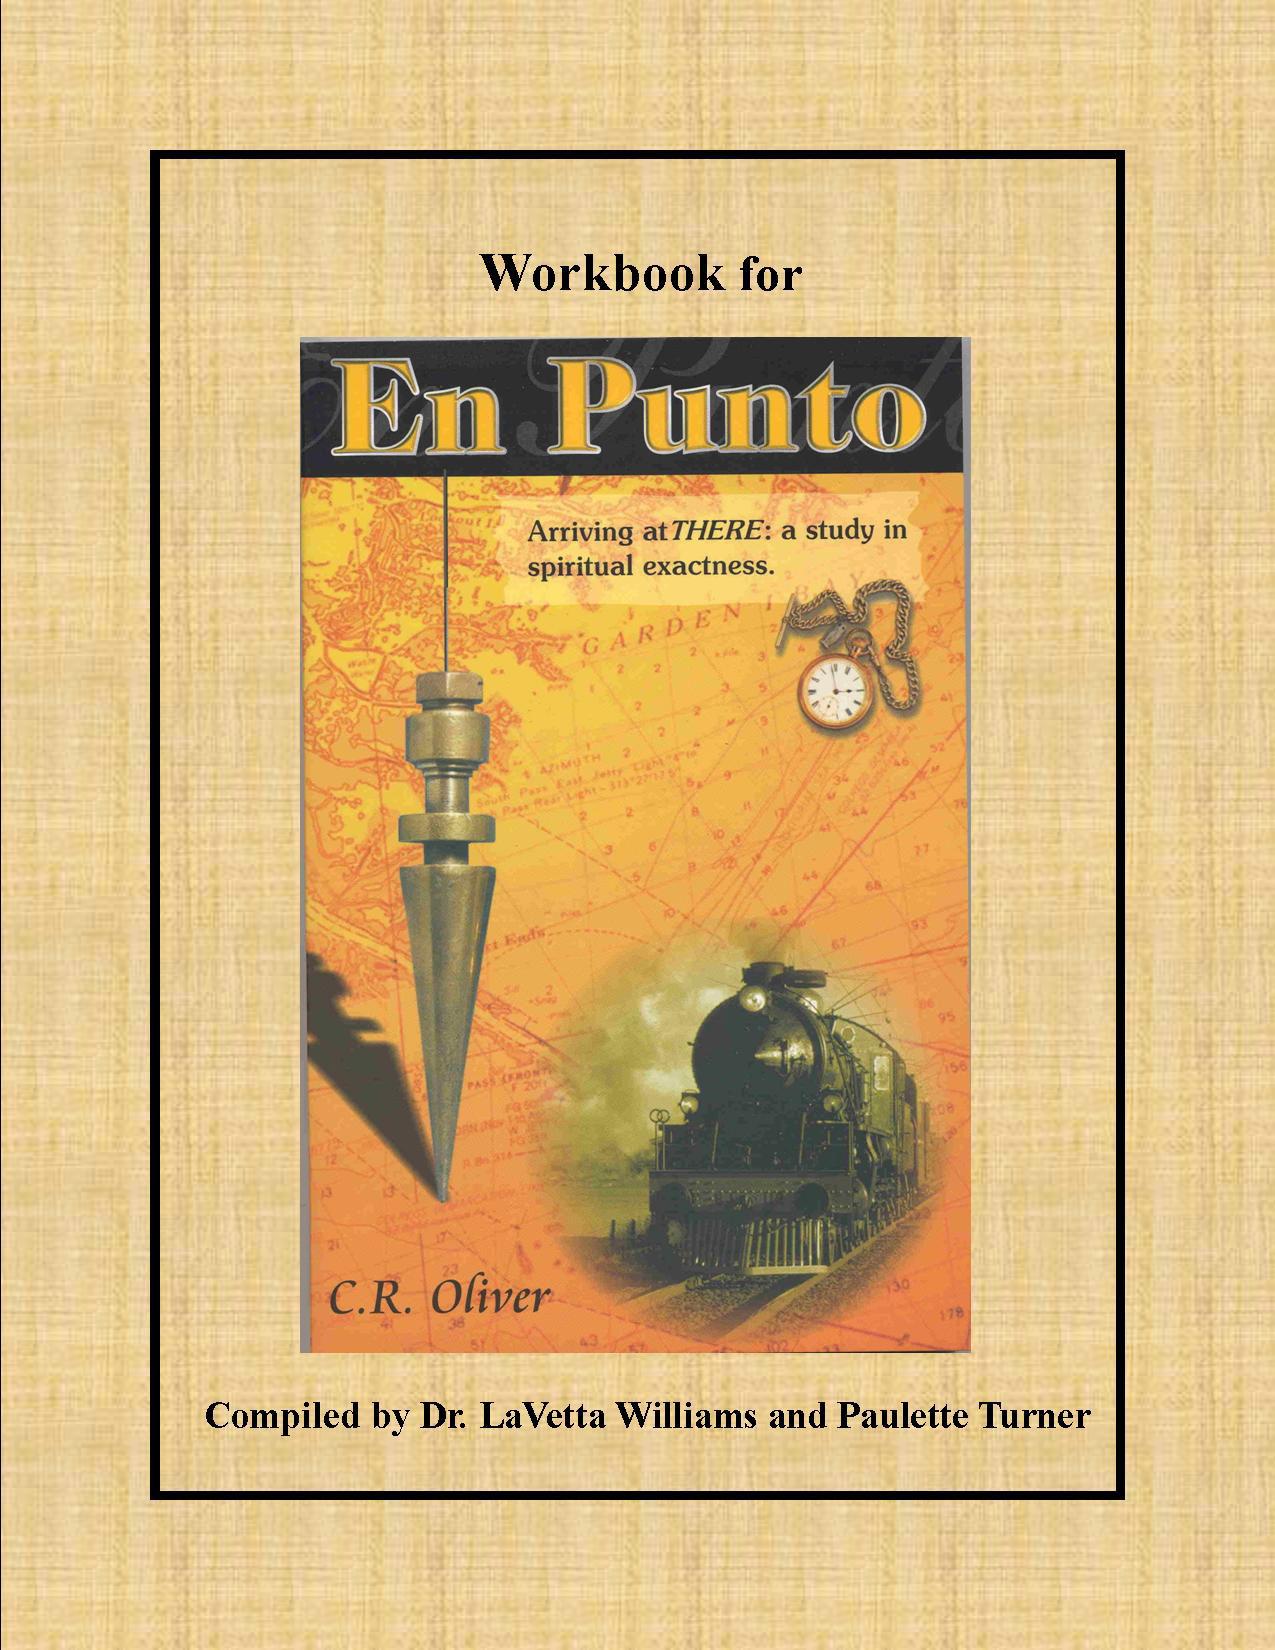 Workbook for En Punto